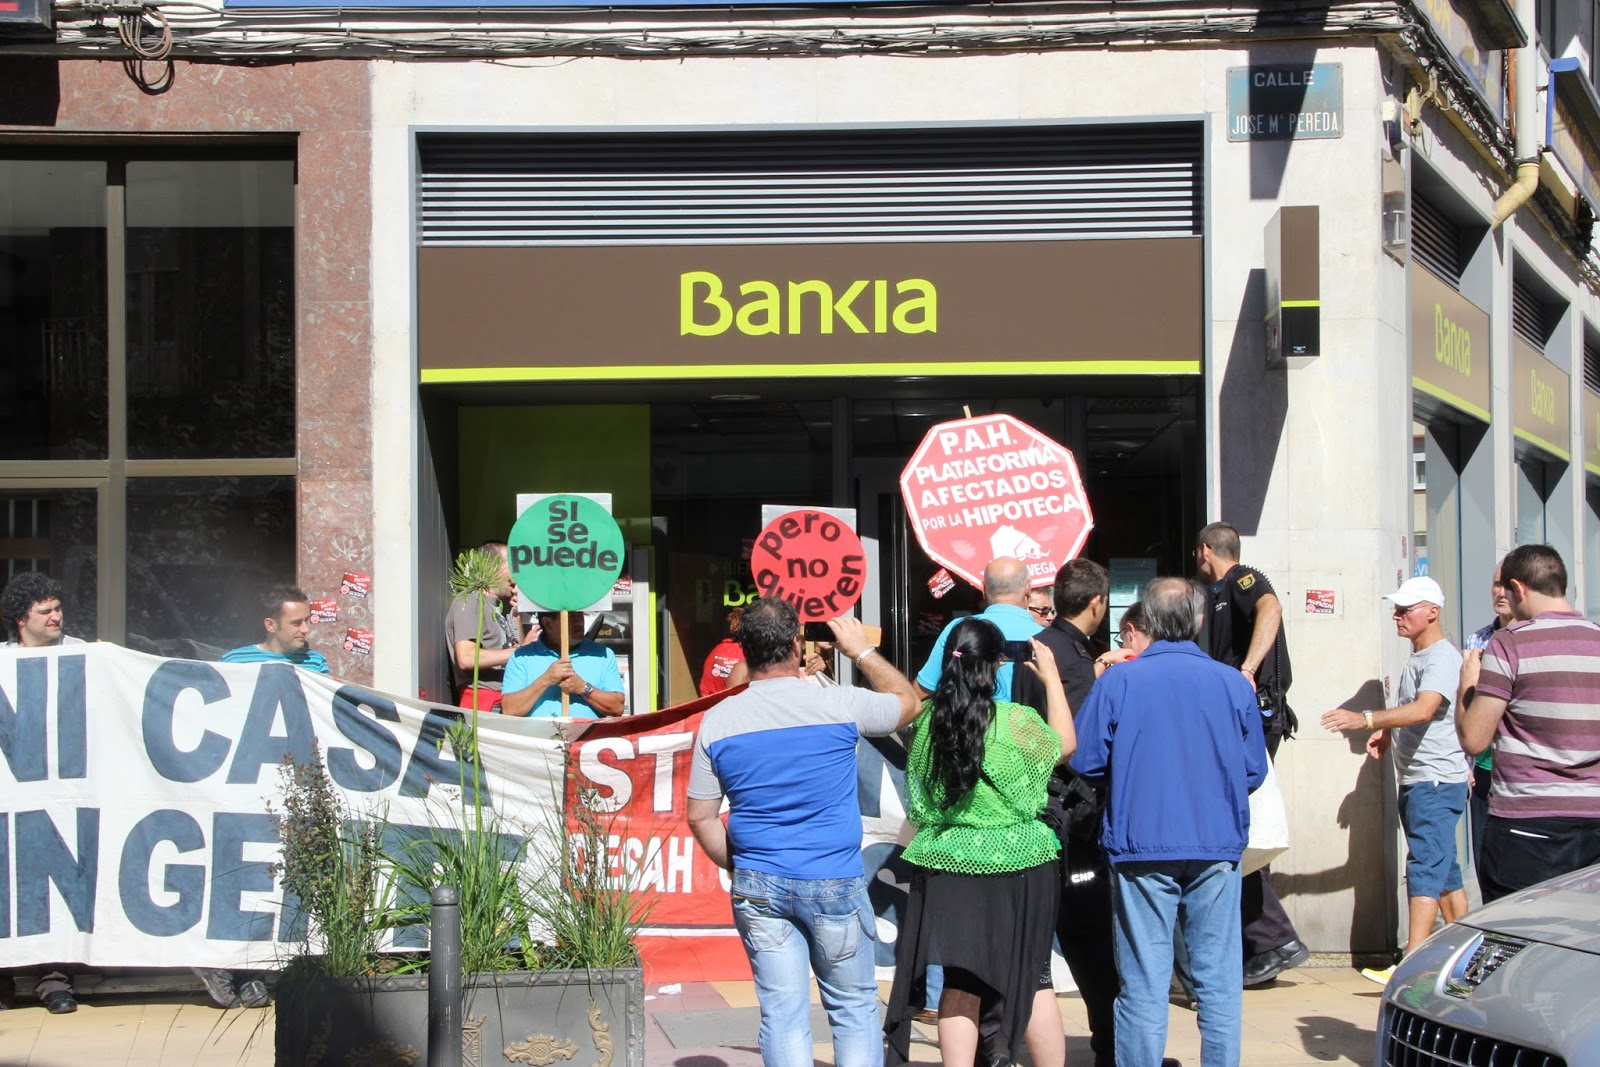 Torrelavega cruce de caminos torrelavega bankia for Bankia oficina por internet